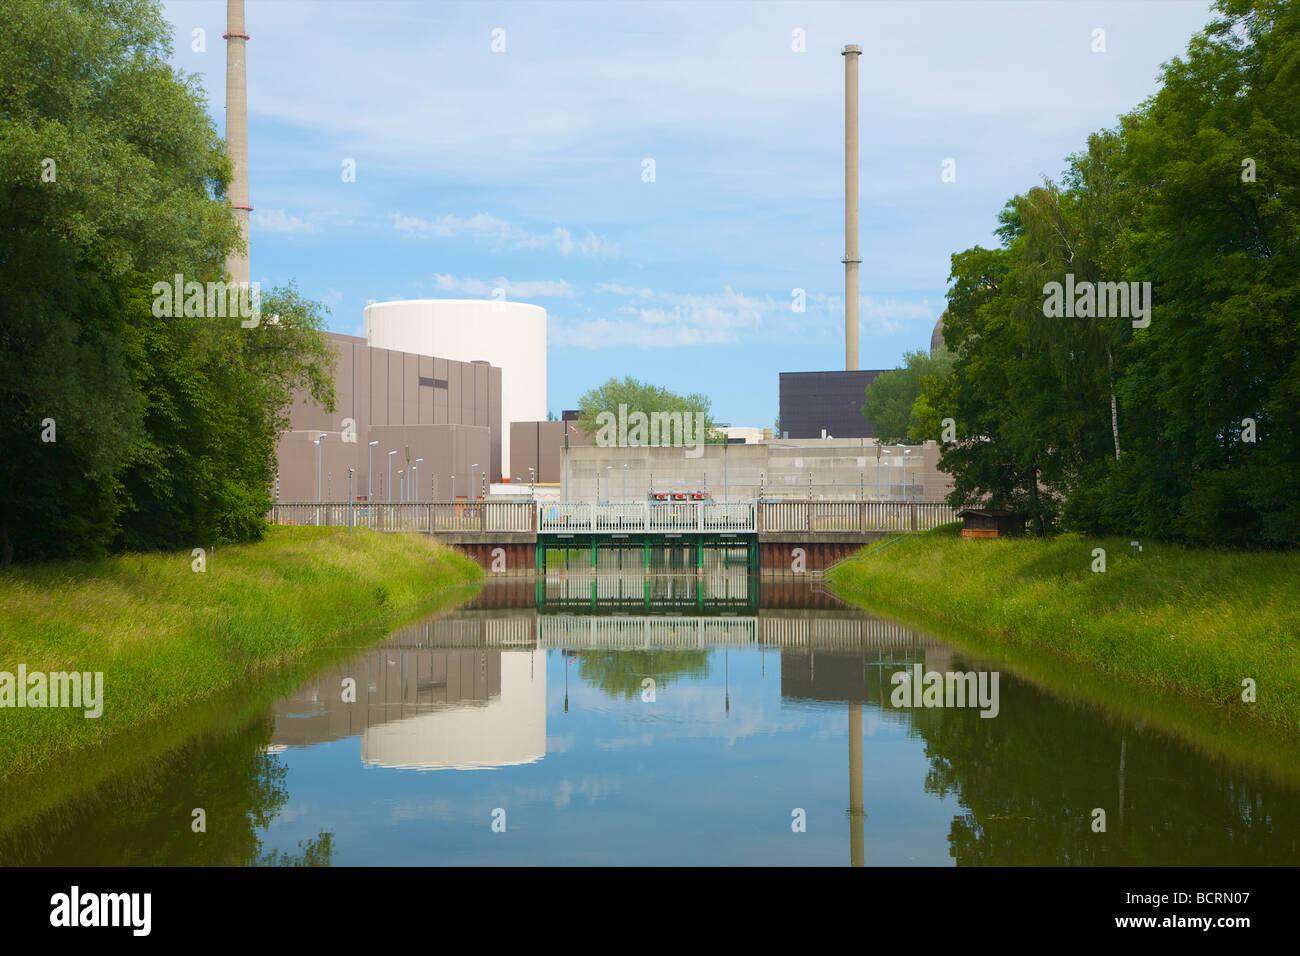 Gundremmingen nuclear power plant in Bavaria, Germany. Cooling water intake from the Danube river. Kernkraftwerk - Stock Image